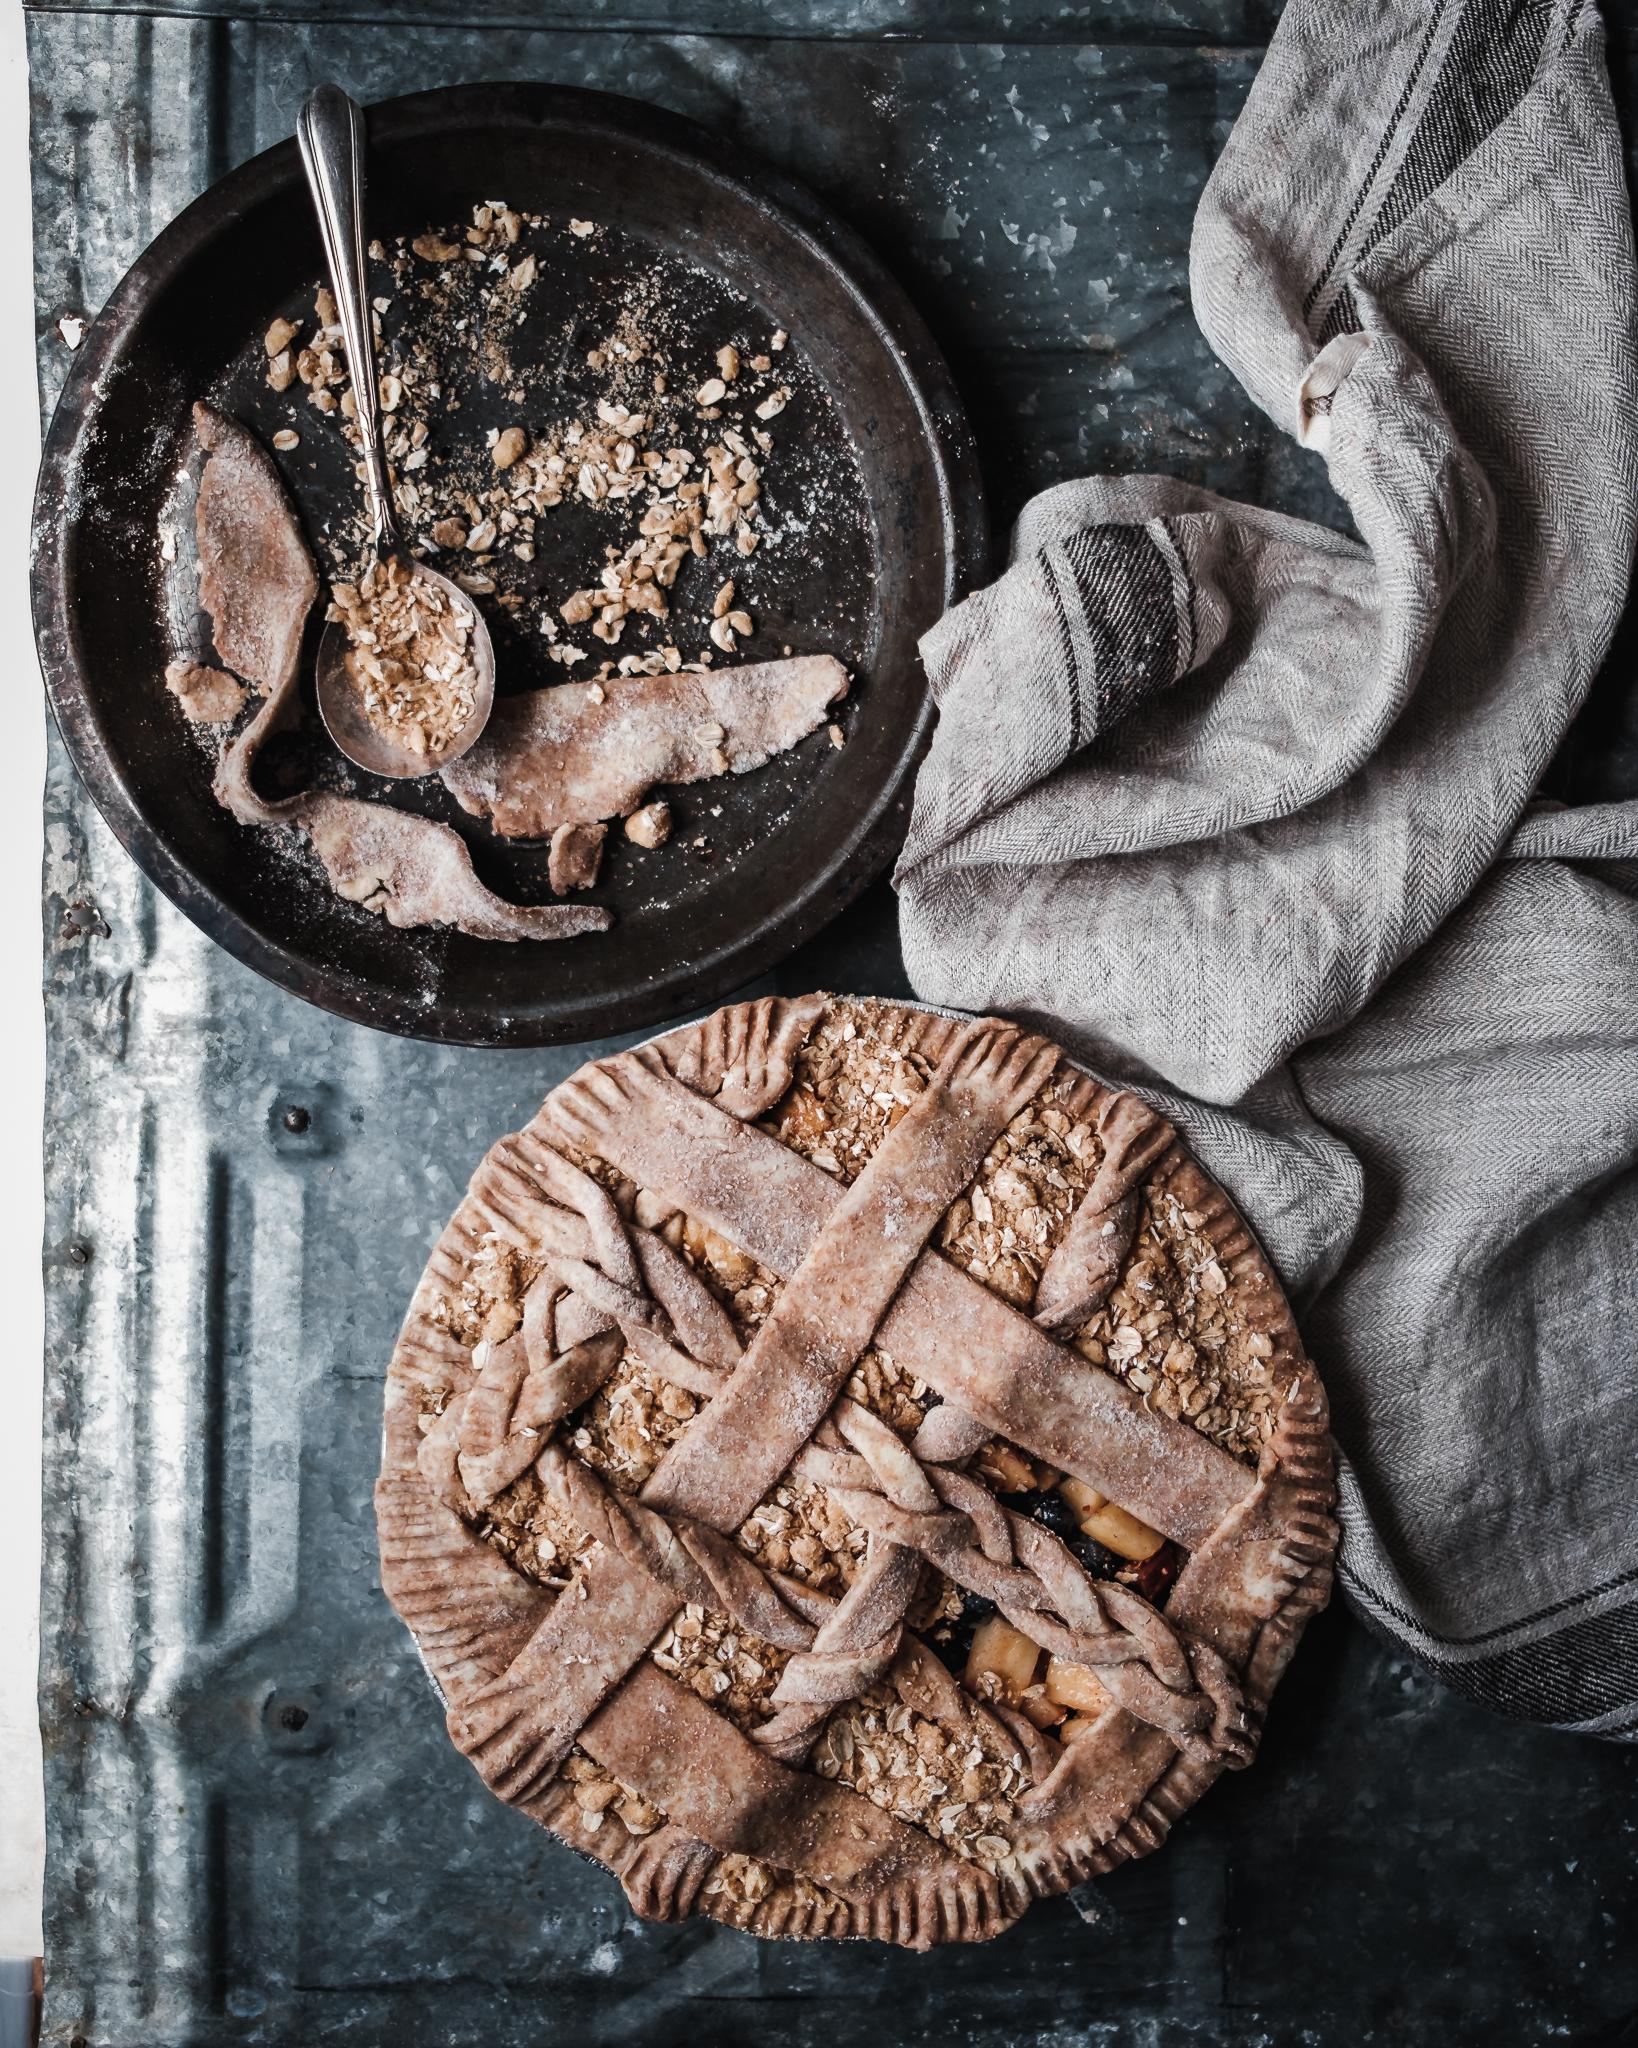 Jennifer hulley food stylist food photographer food writer hamilton toronto ontario